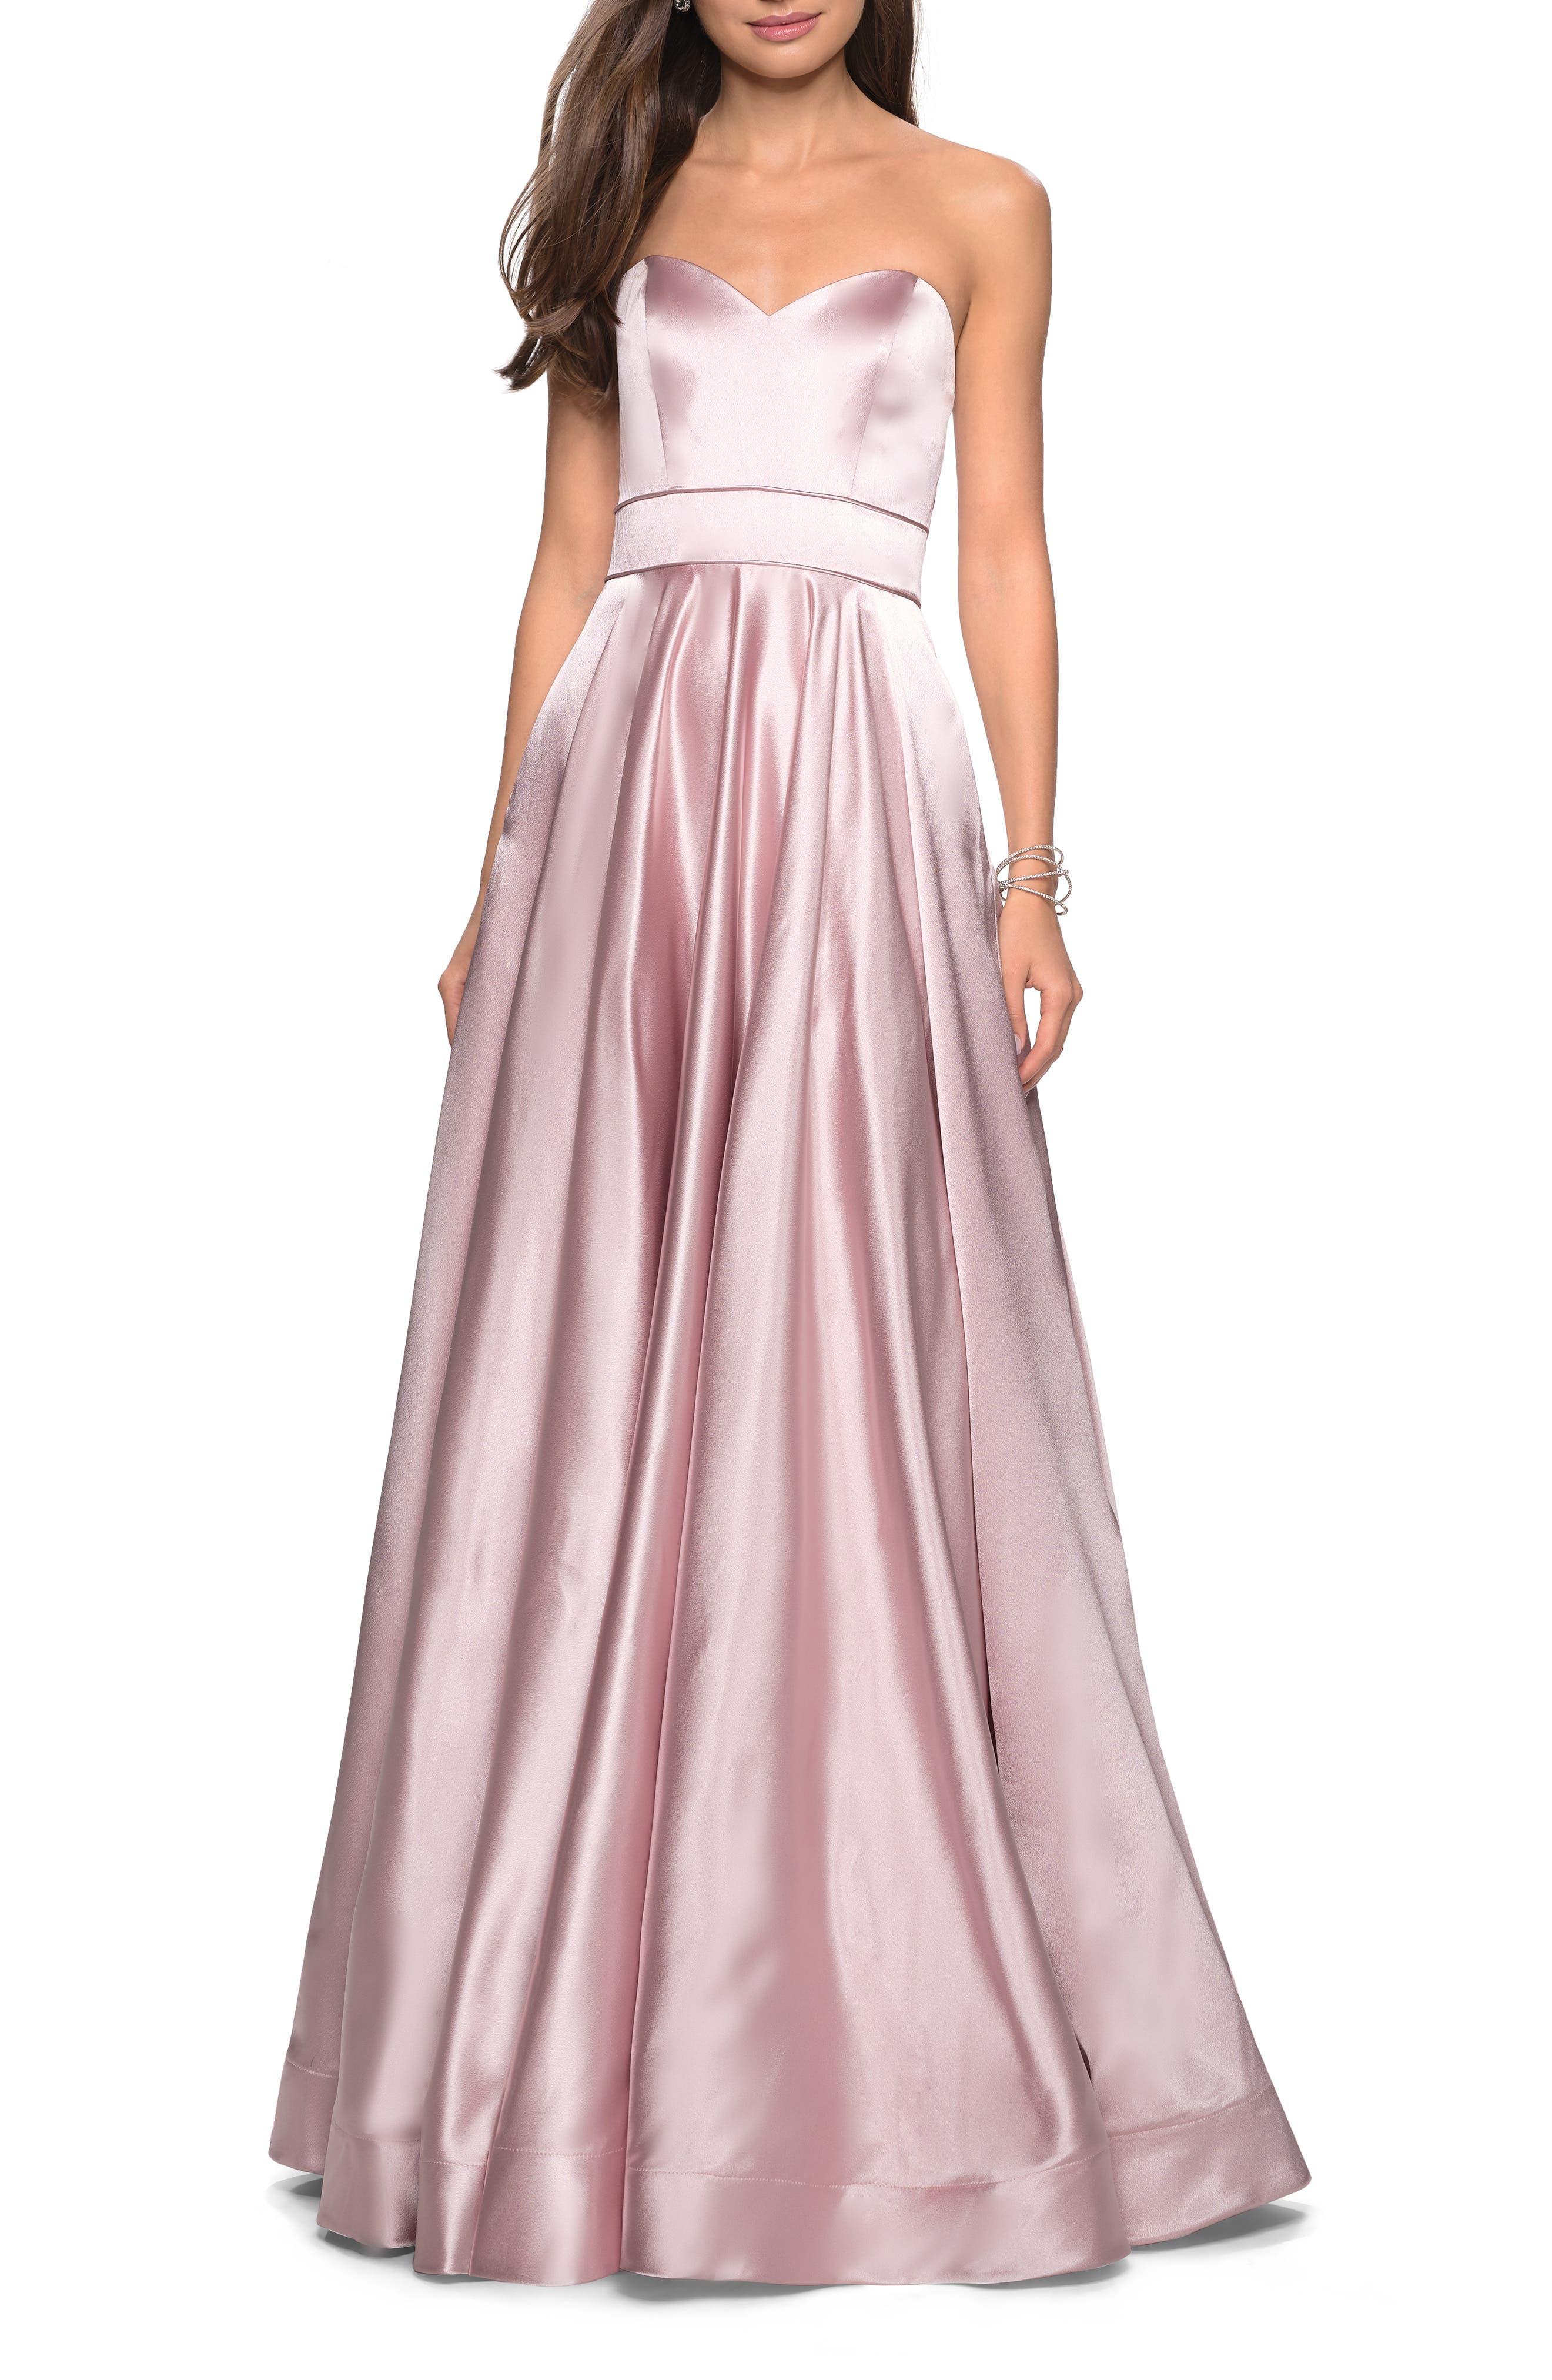 La Femme Strapless Satin Evening Dress, Pink